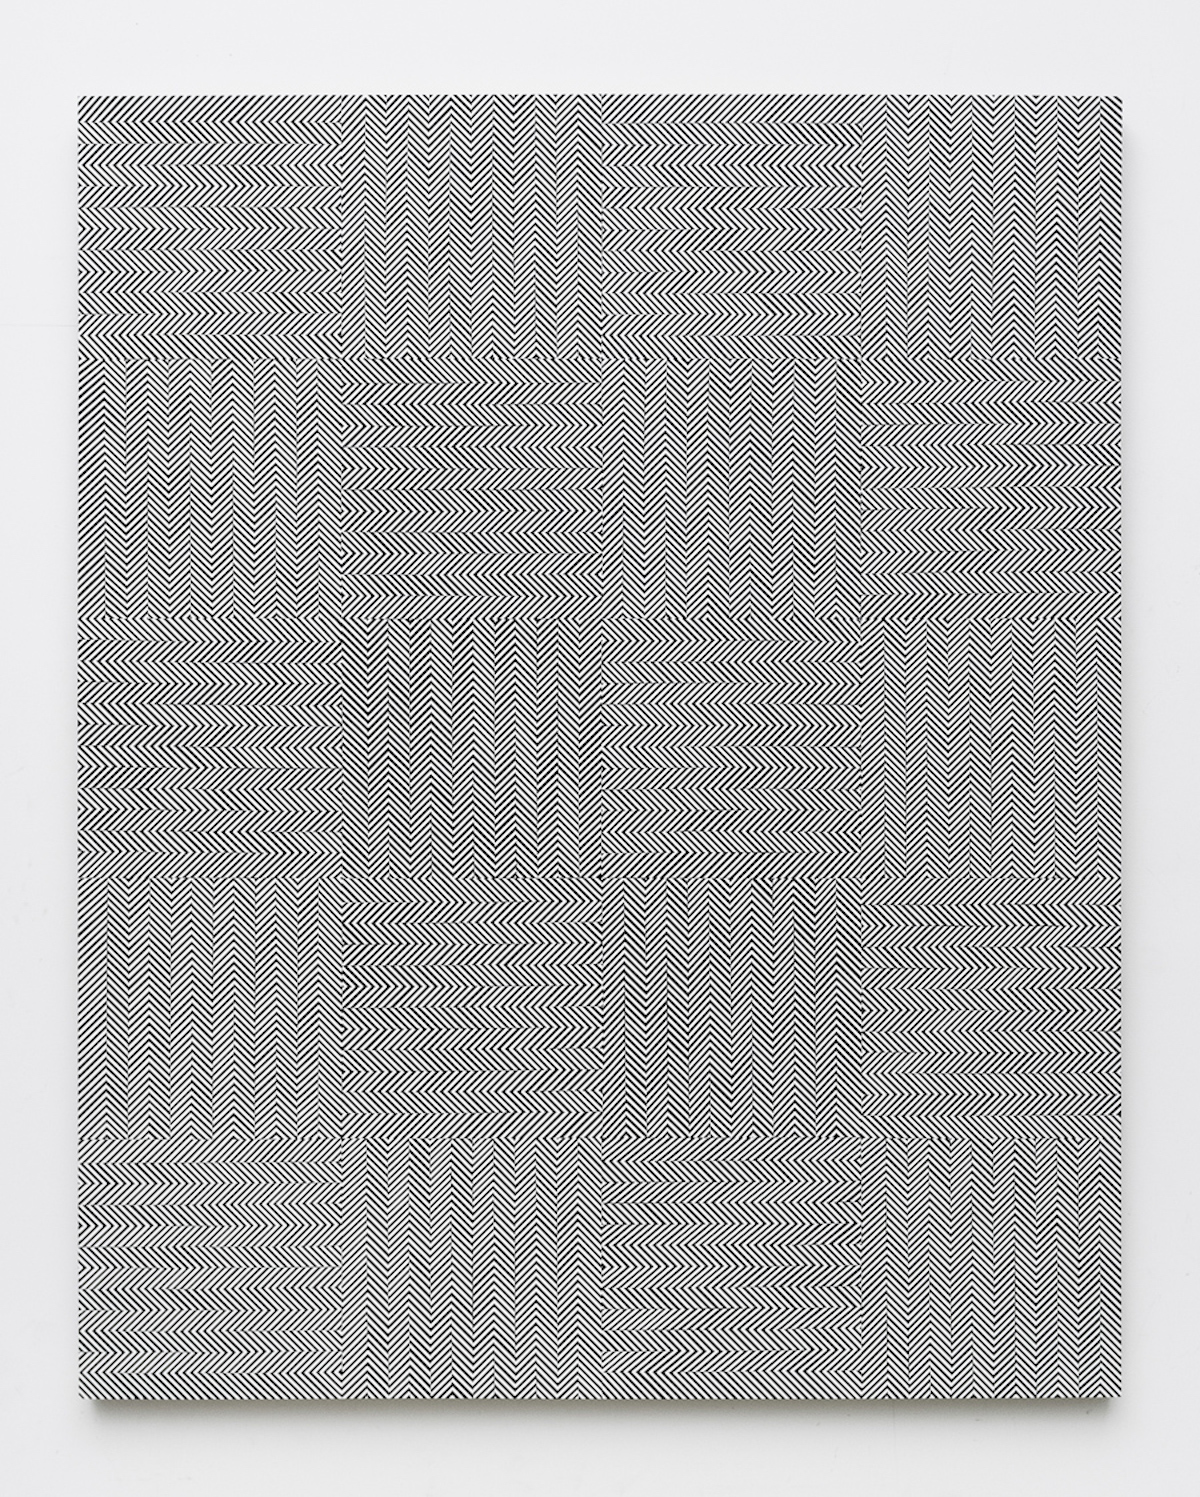 Johnny Abrahams_Untitled9_Acrylic on panel_119.4x152.4cm_2014.jpg